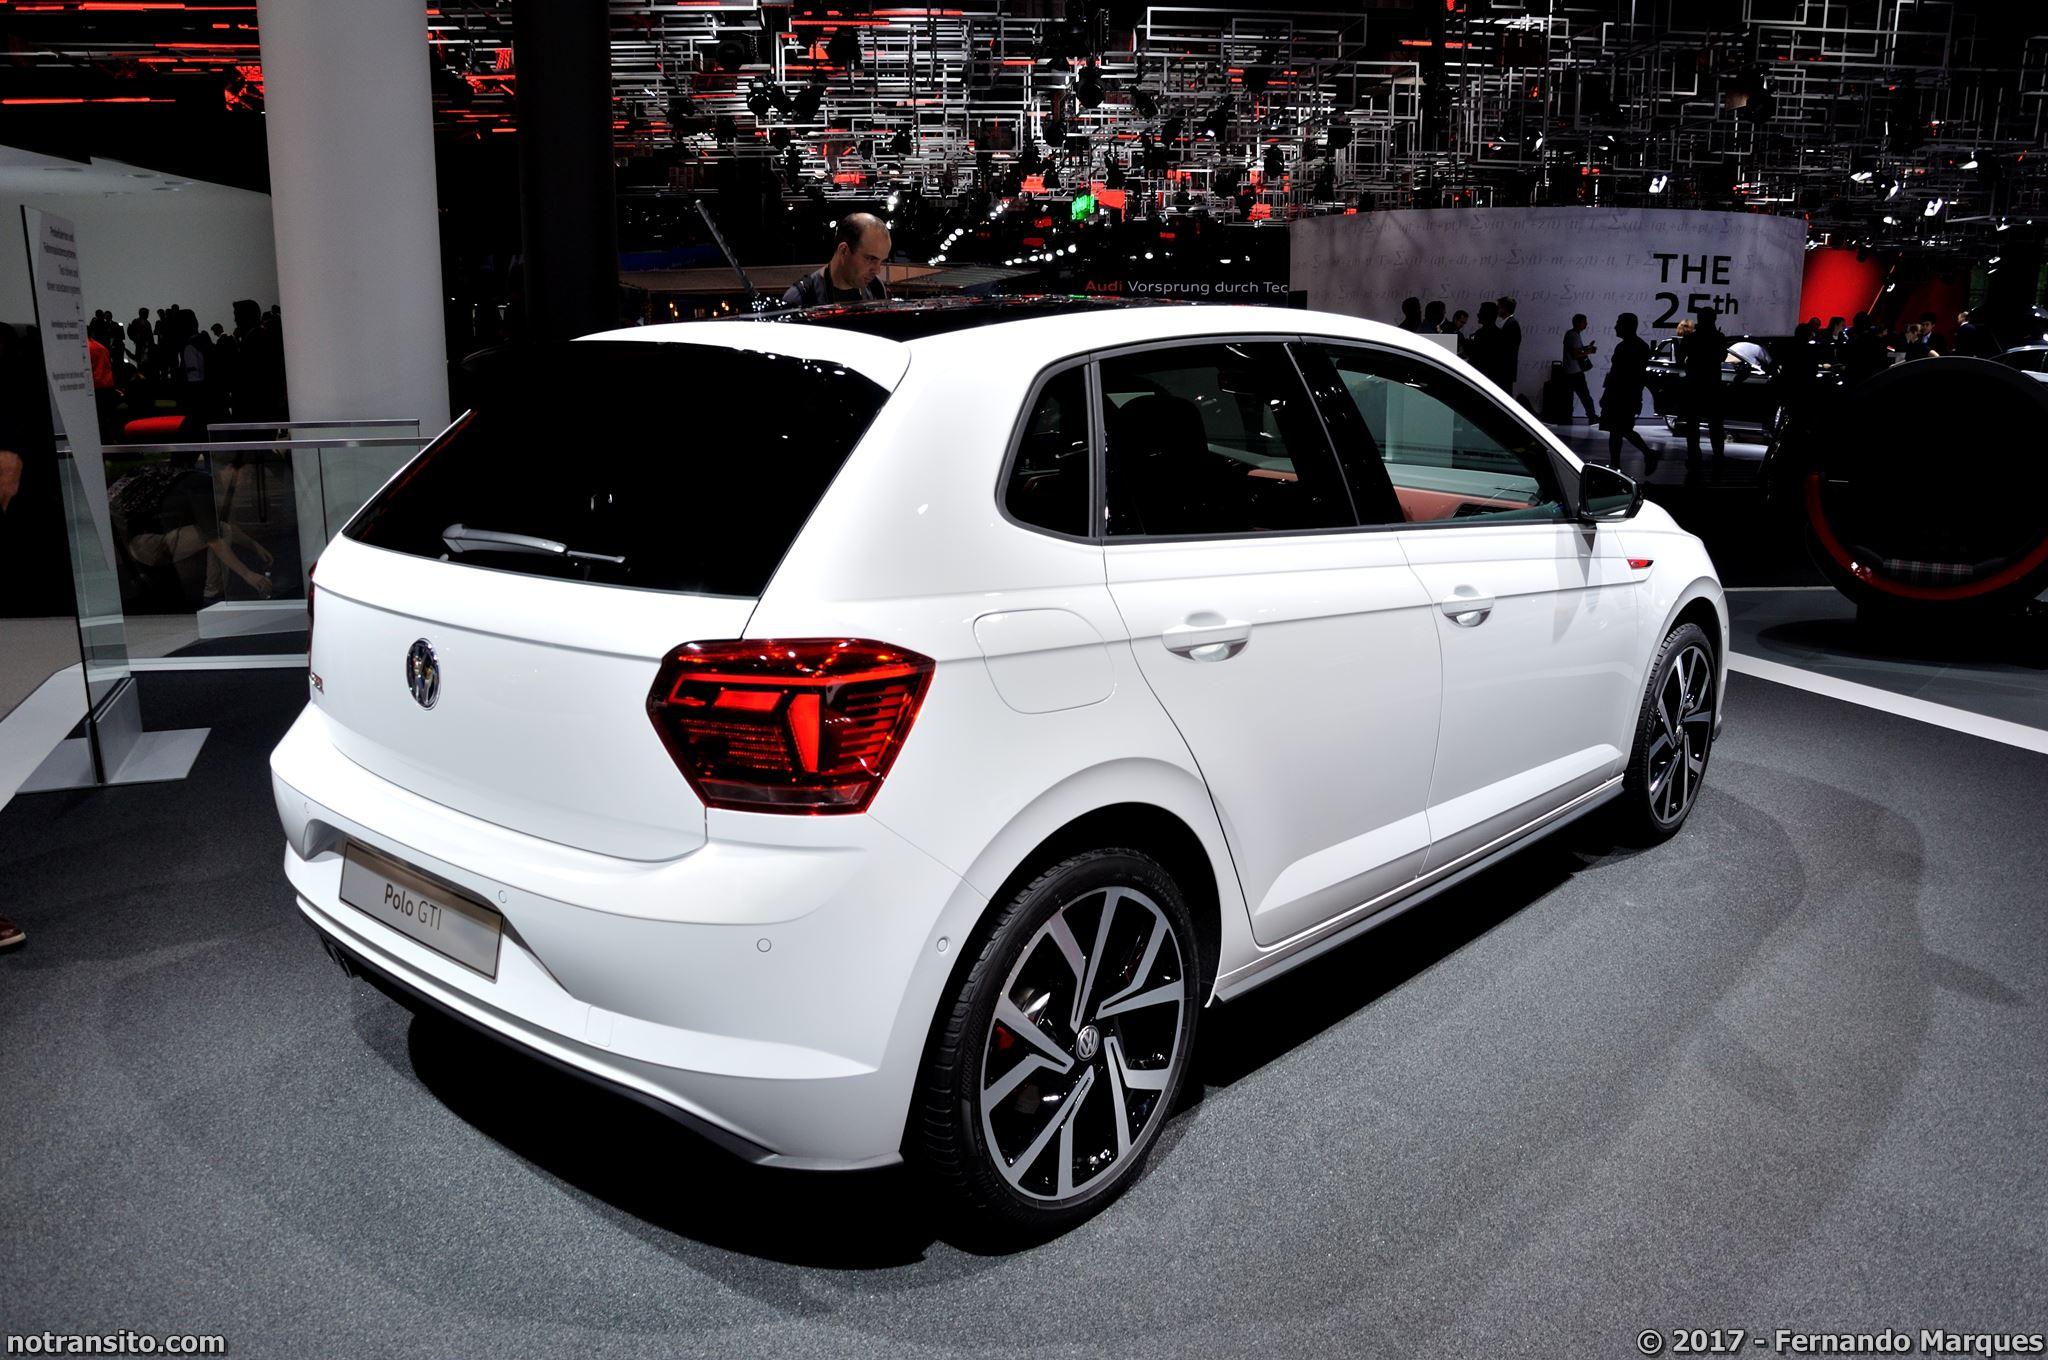 Volkswagen-Polo-GTI-Frankfurt-2017-008